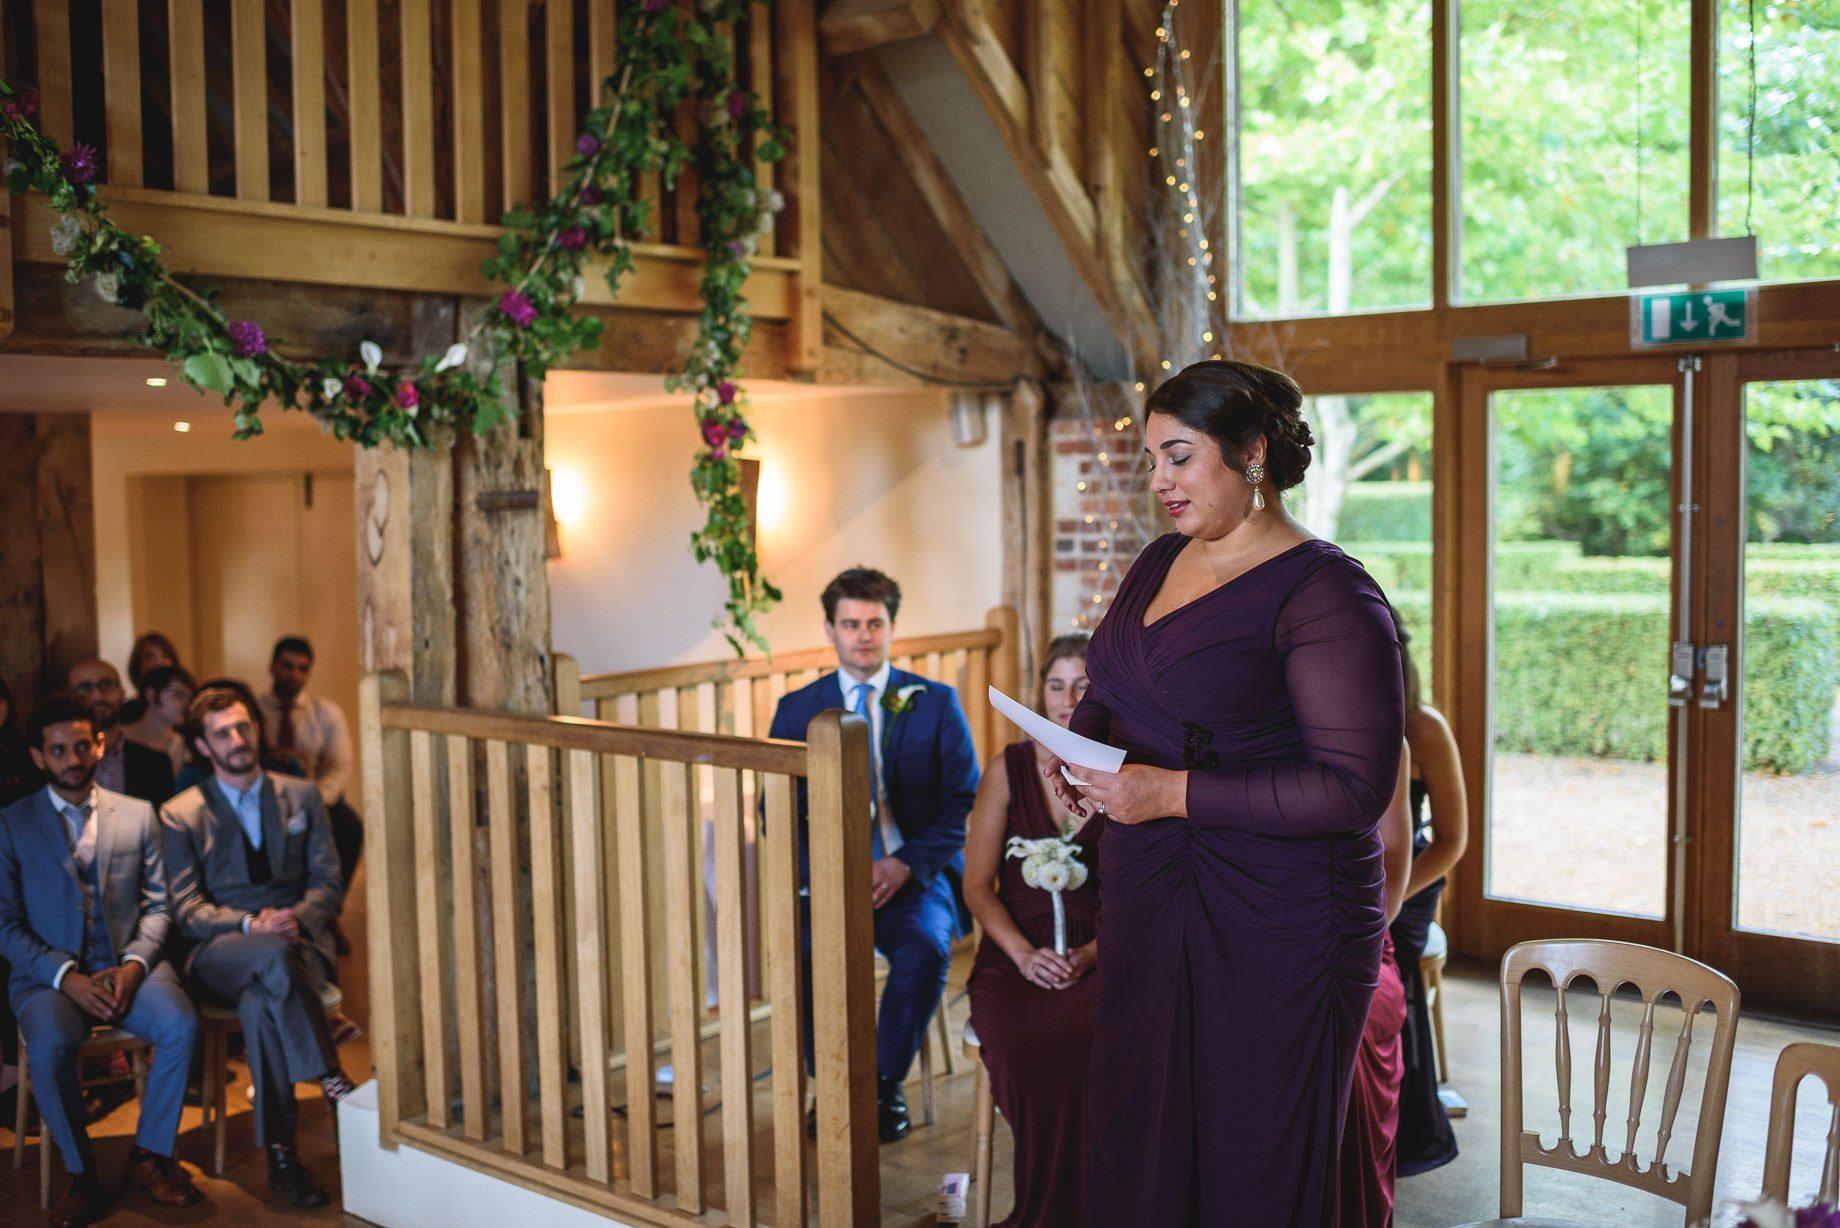 bury-court-barn-wedding-photography-guy-collier-photography-nadia-tom-58-of-184